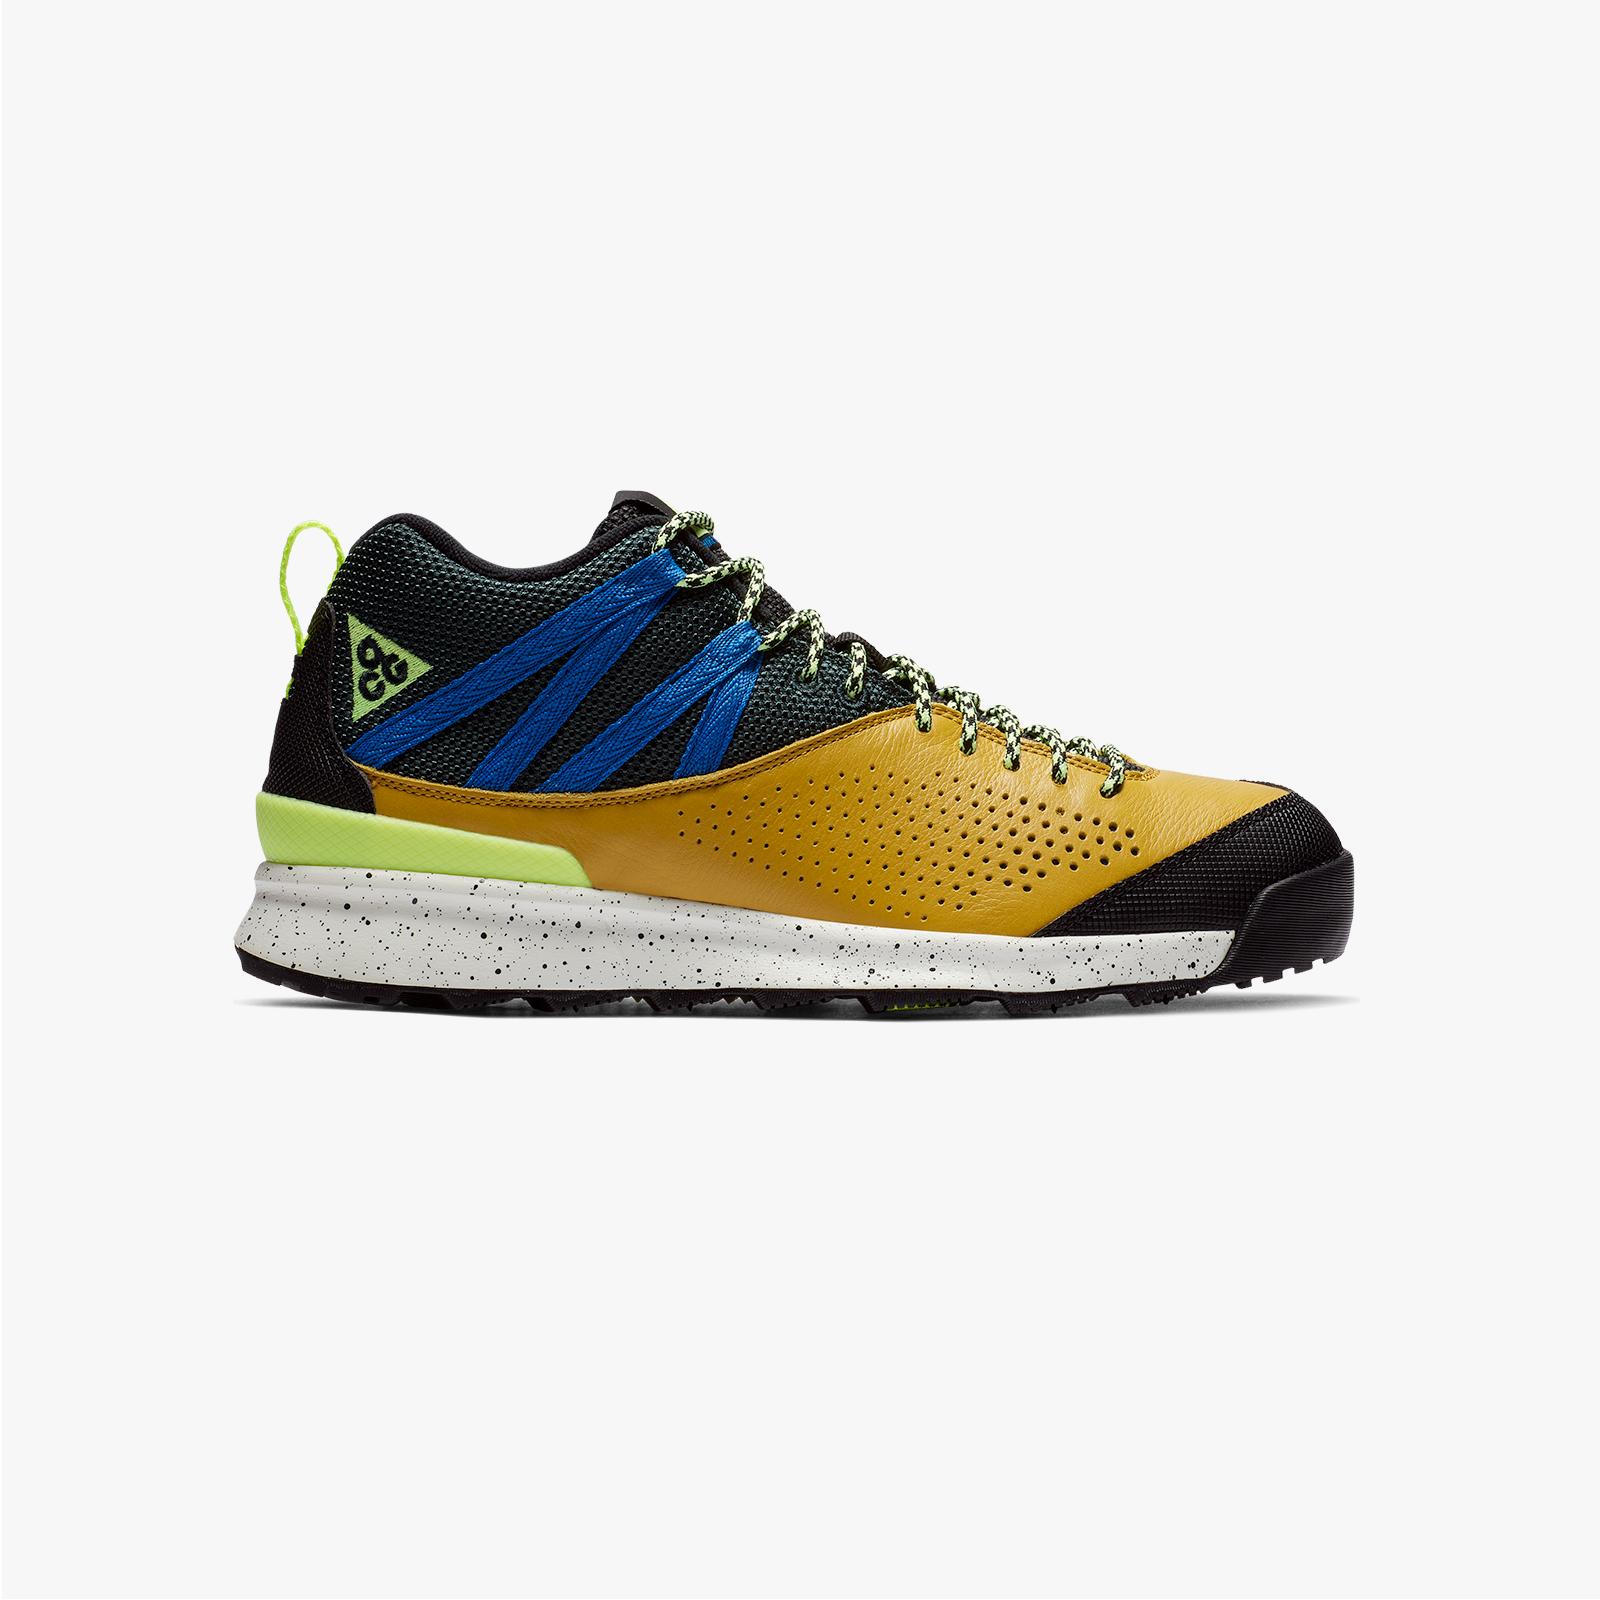 low priced 1b418 7789e Nike ACG Okwahn II